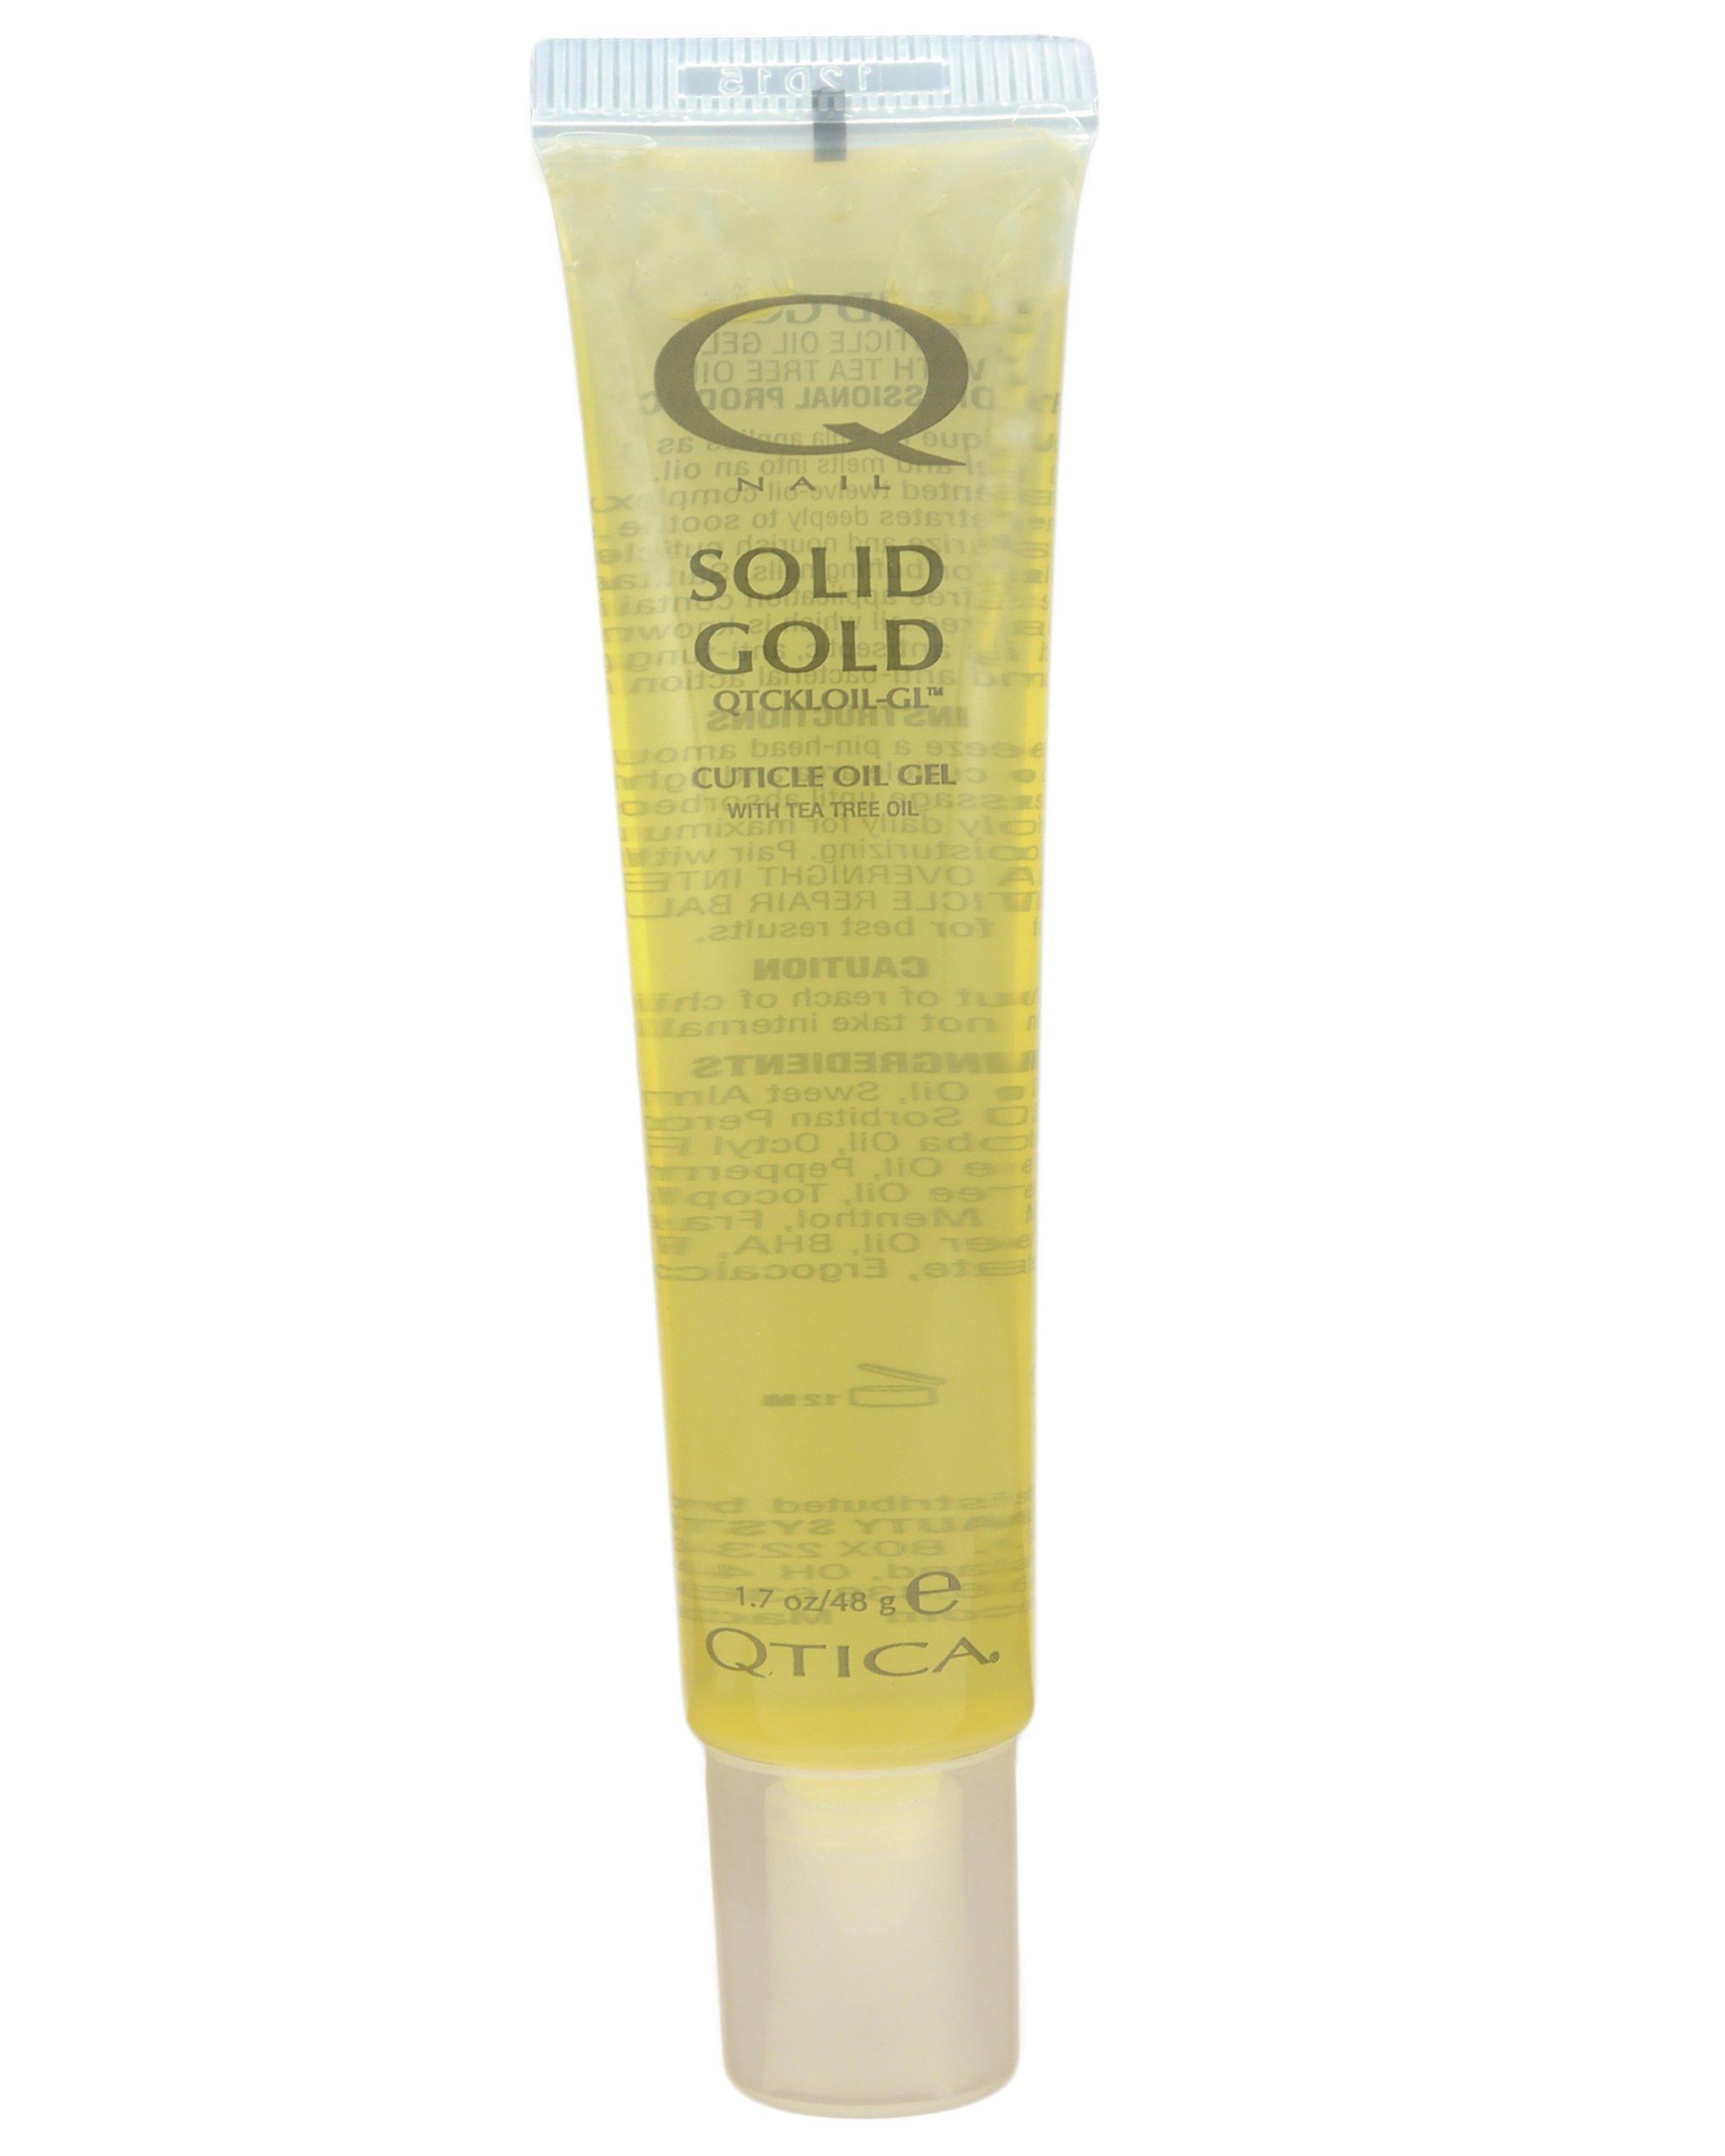 QTICA Solid Gold Anti-Bacterial Oil Gel - 1.7oz